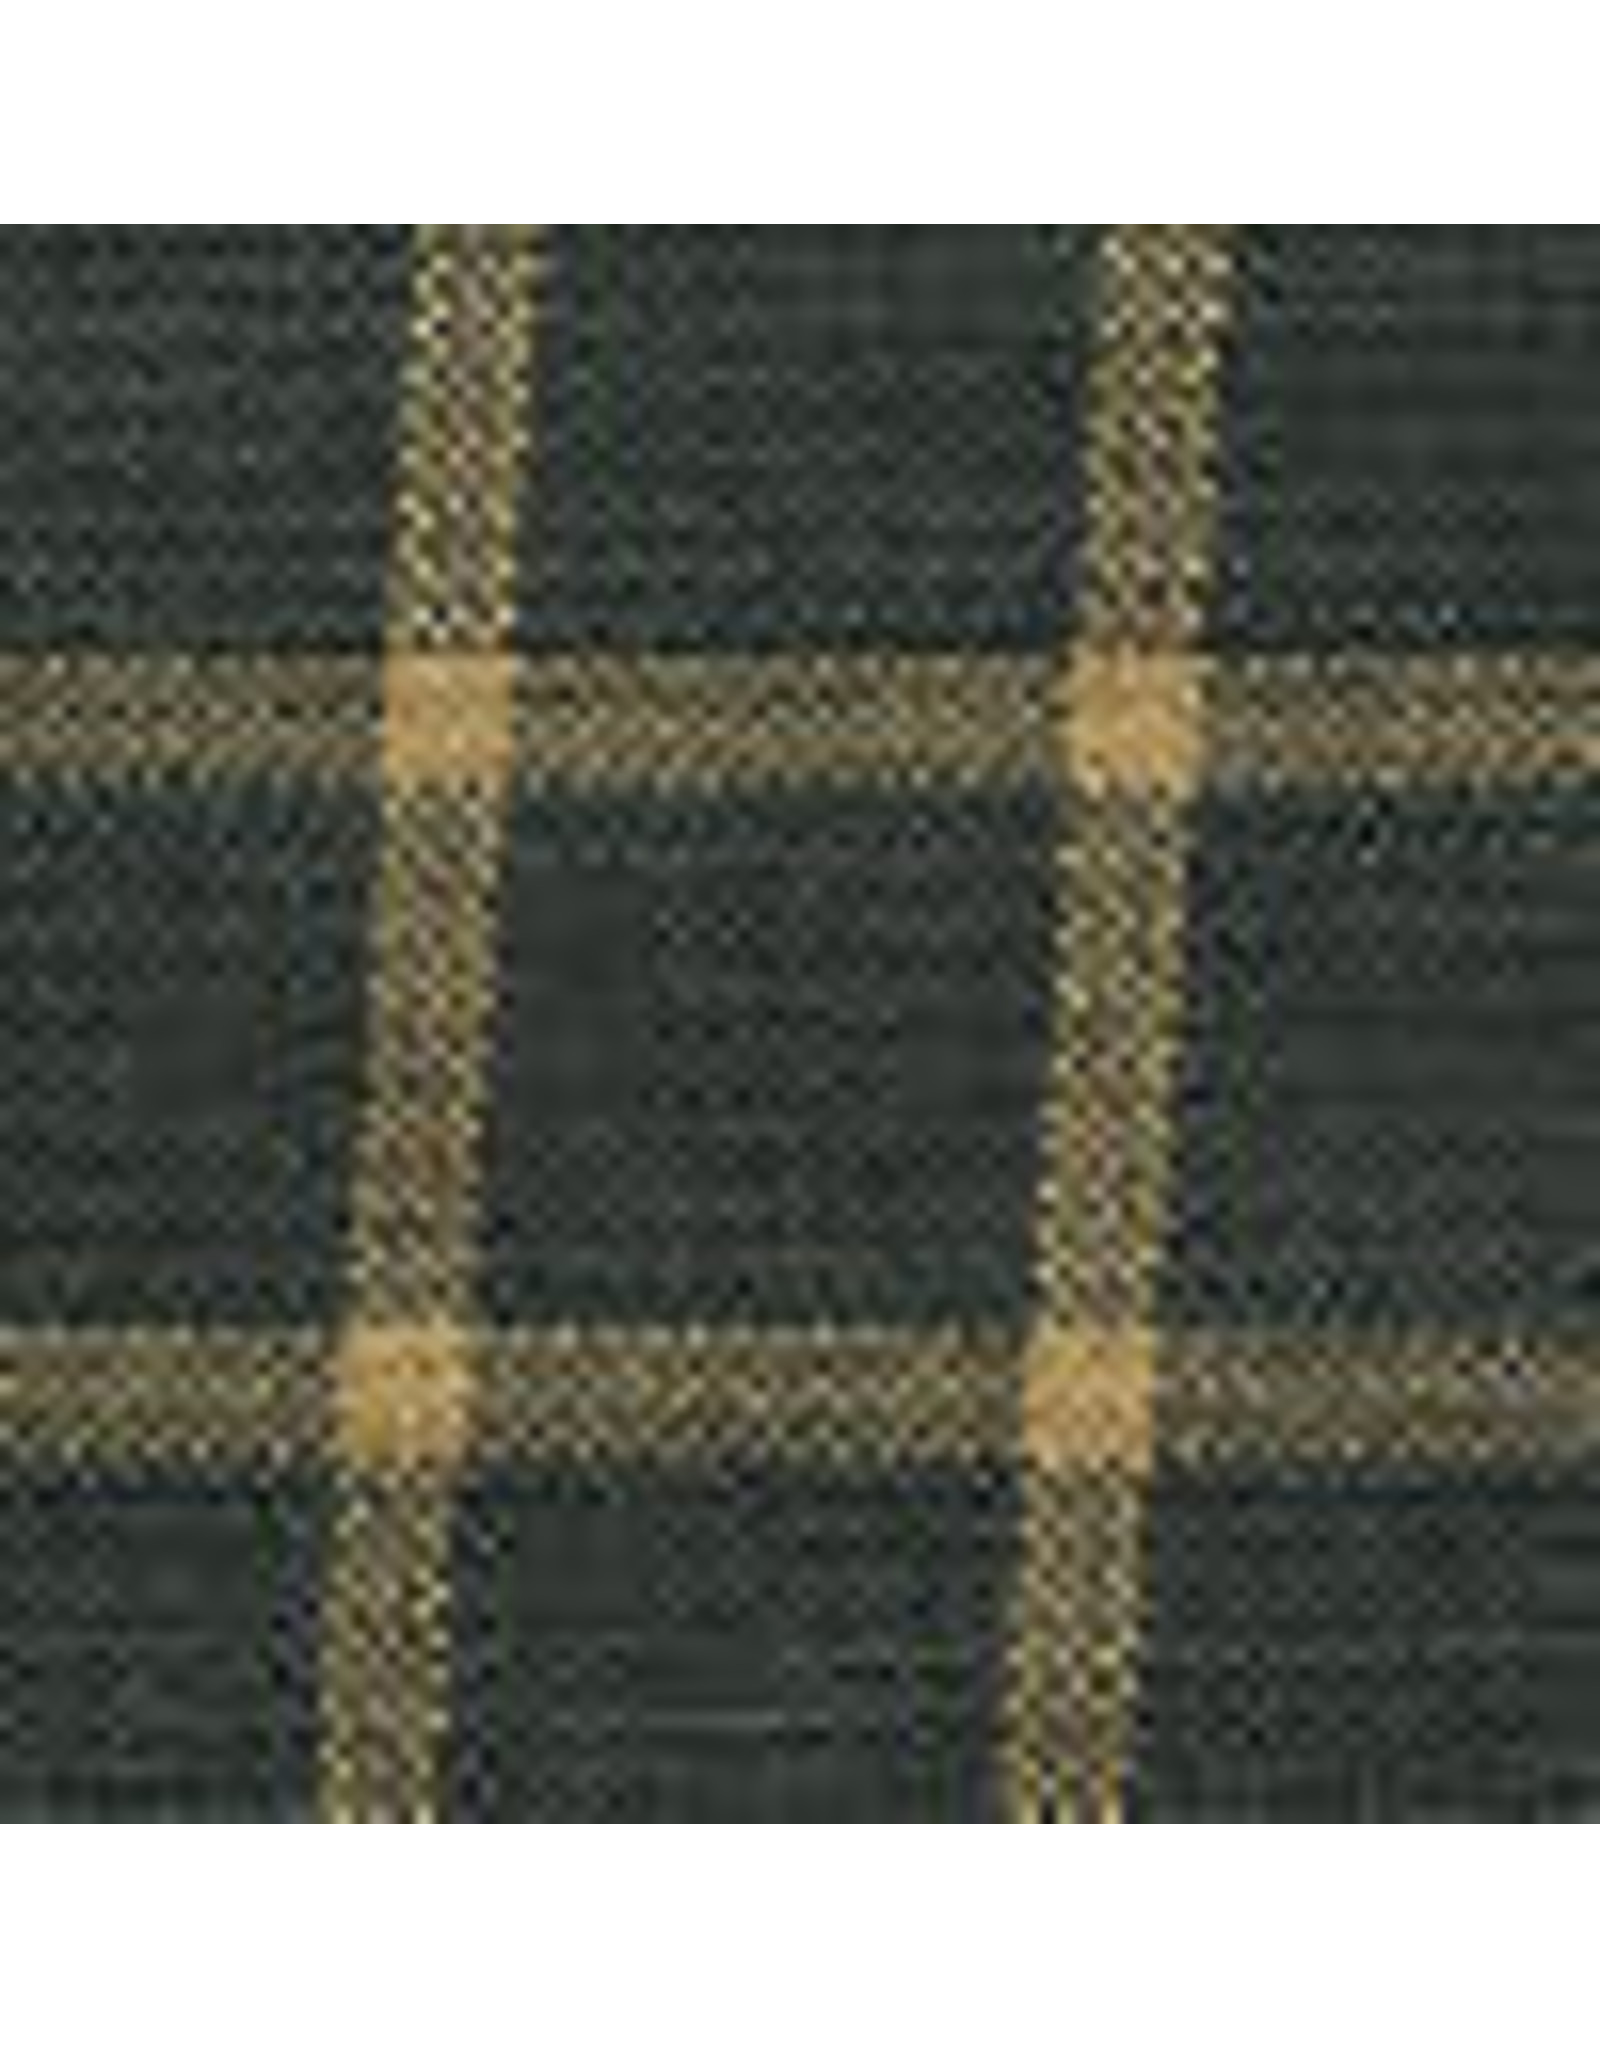 Yd. Green and Tan Reverse Window Pane Fabric #401